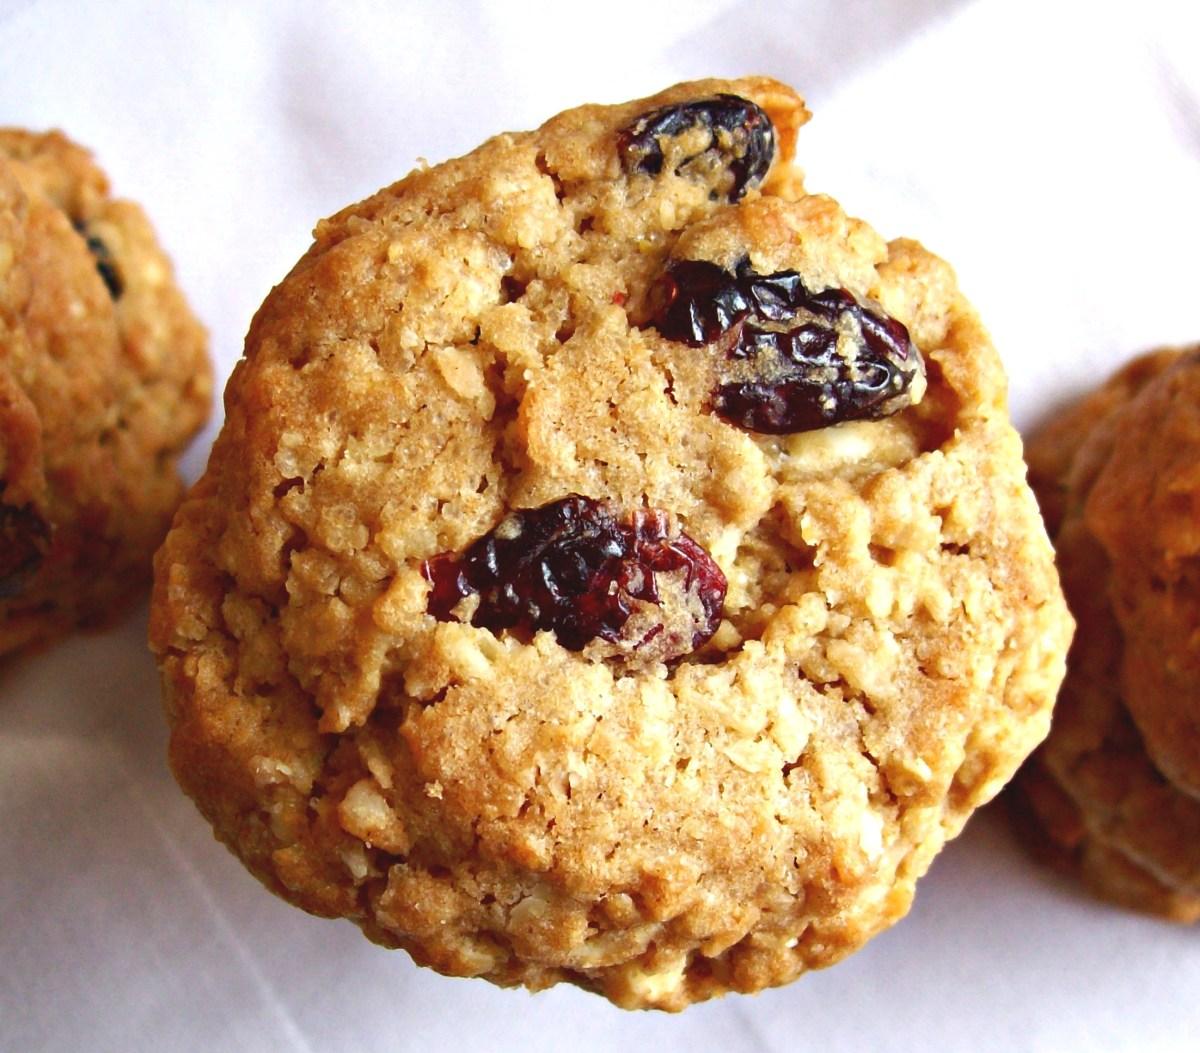 Biscuits à l'avoine canneberge-coco-chocolat blanc